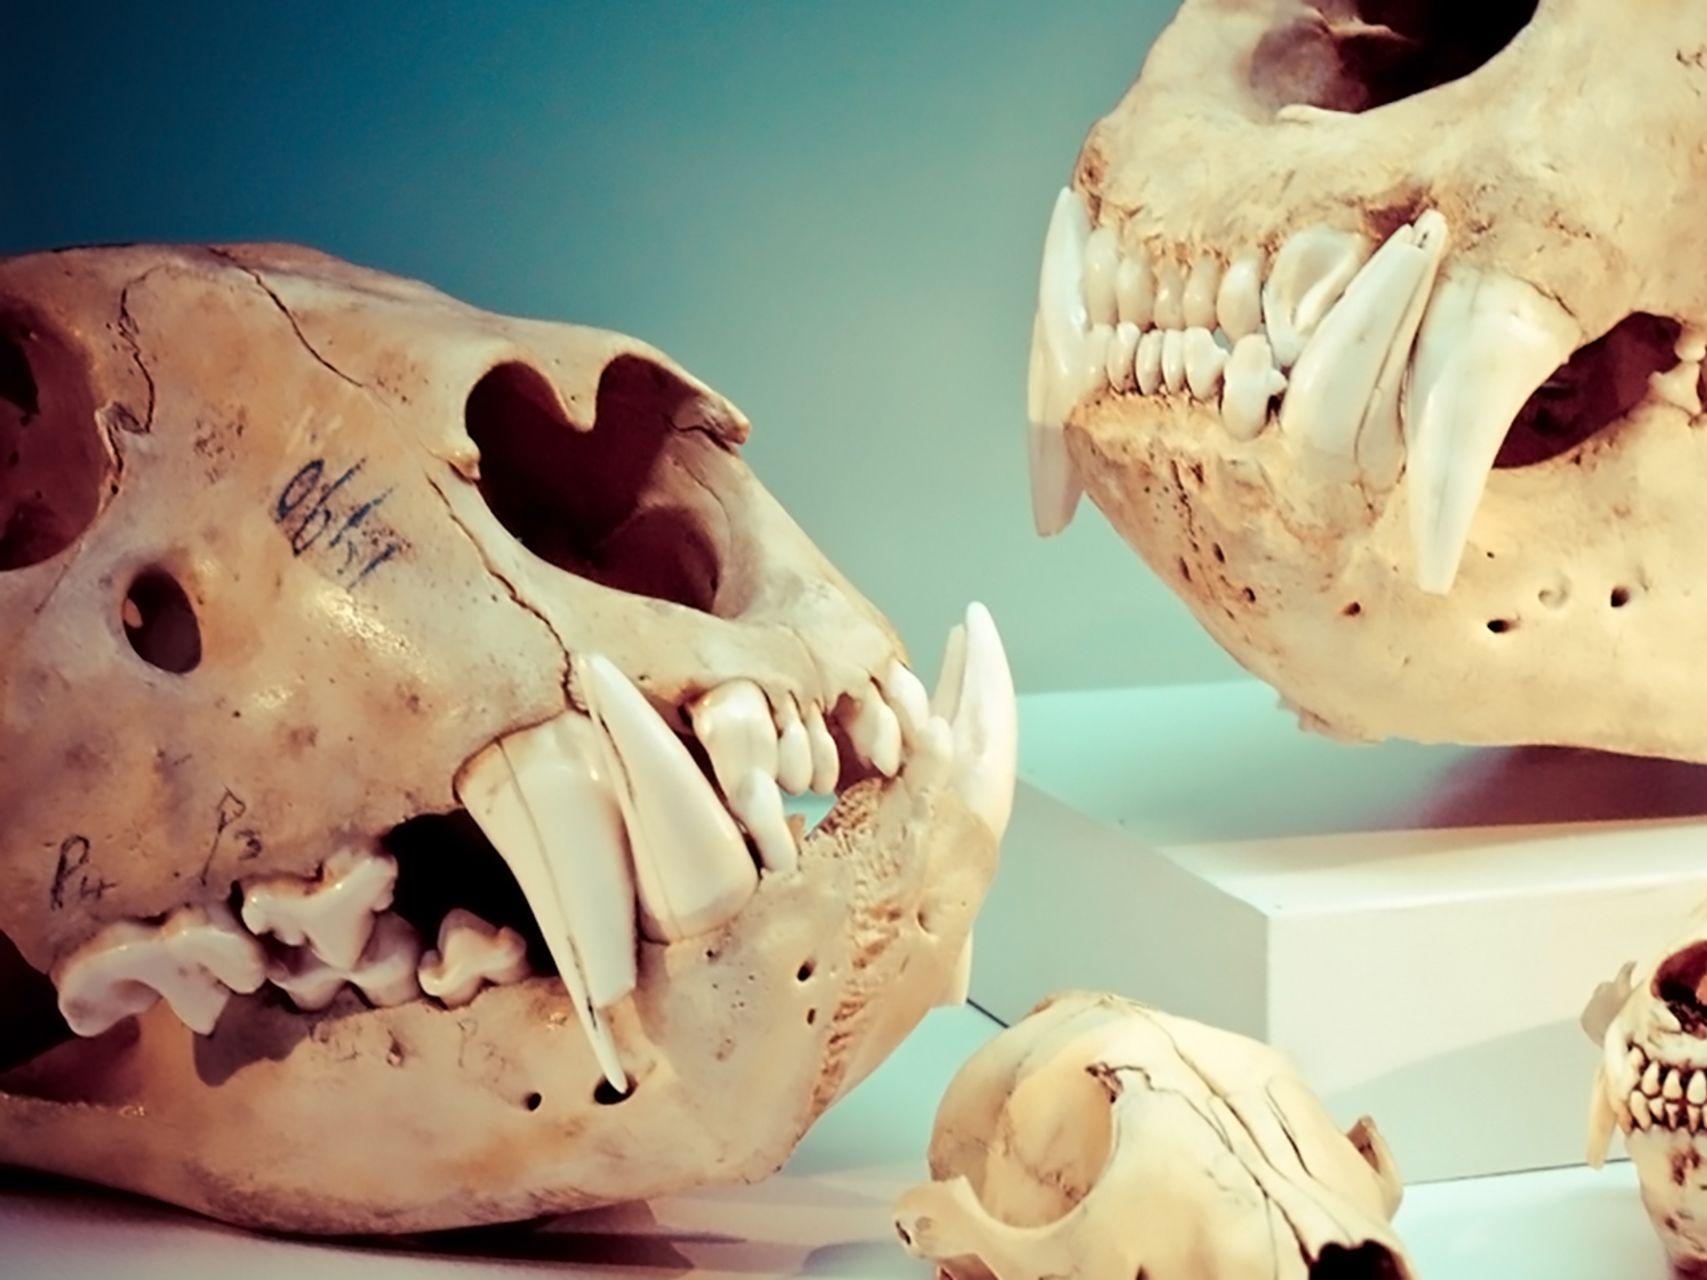 Jis 0216 vancouver skulls beaty museum s5uspz